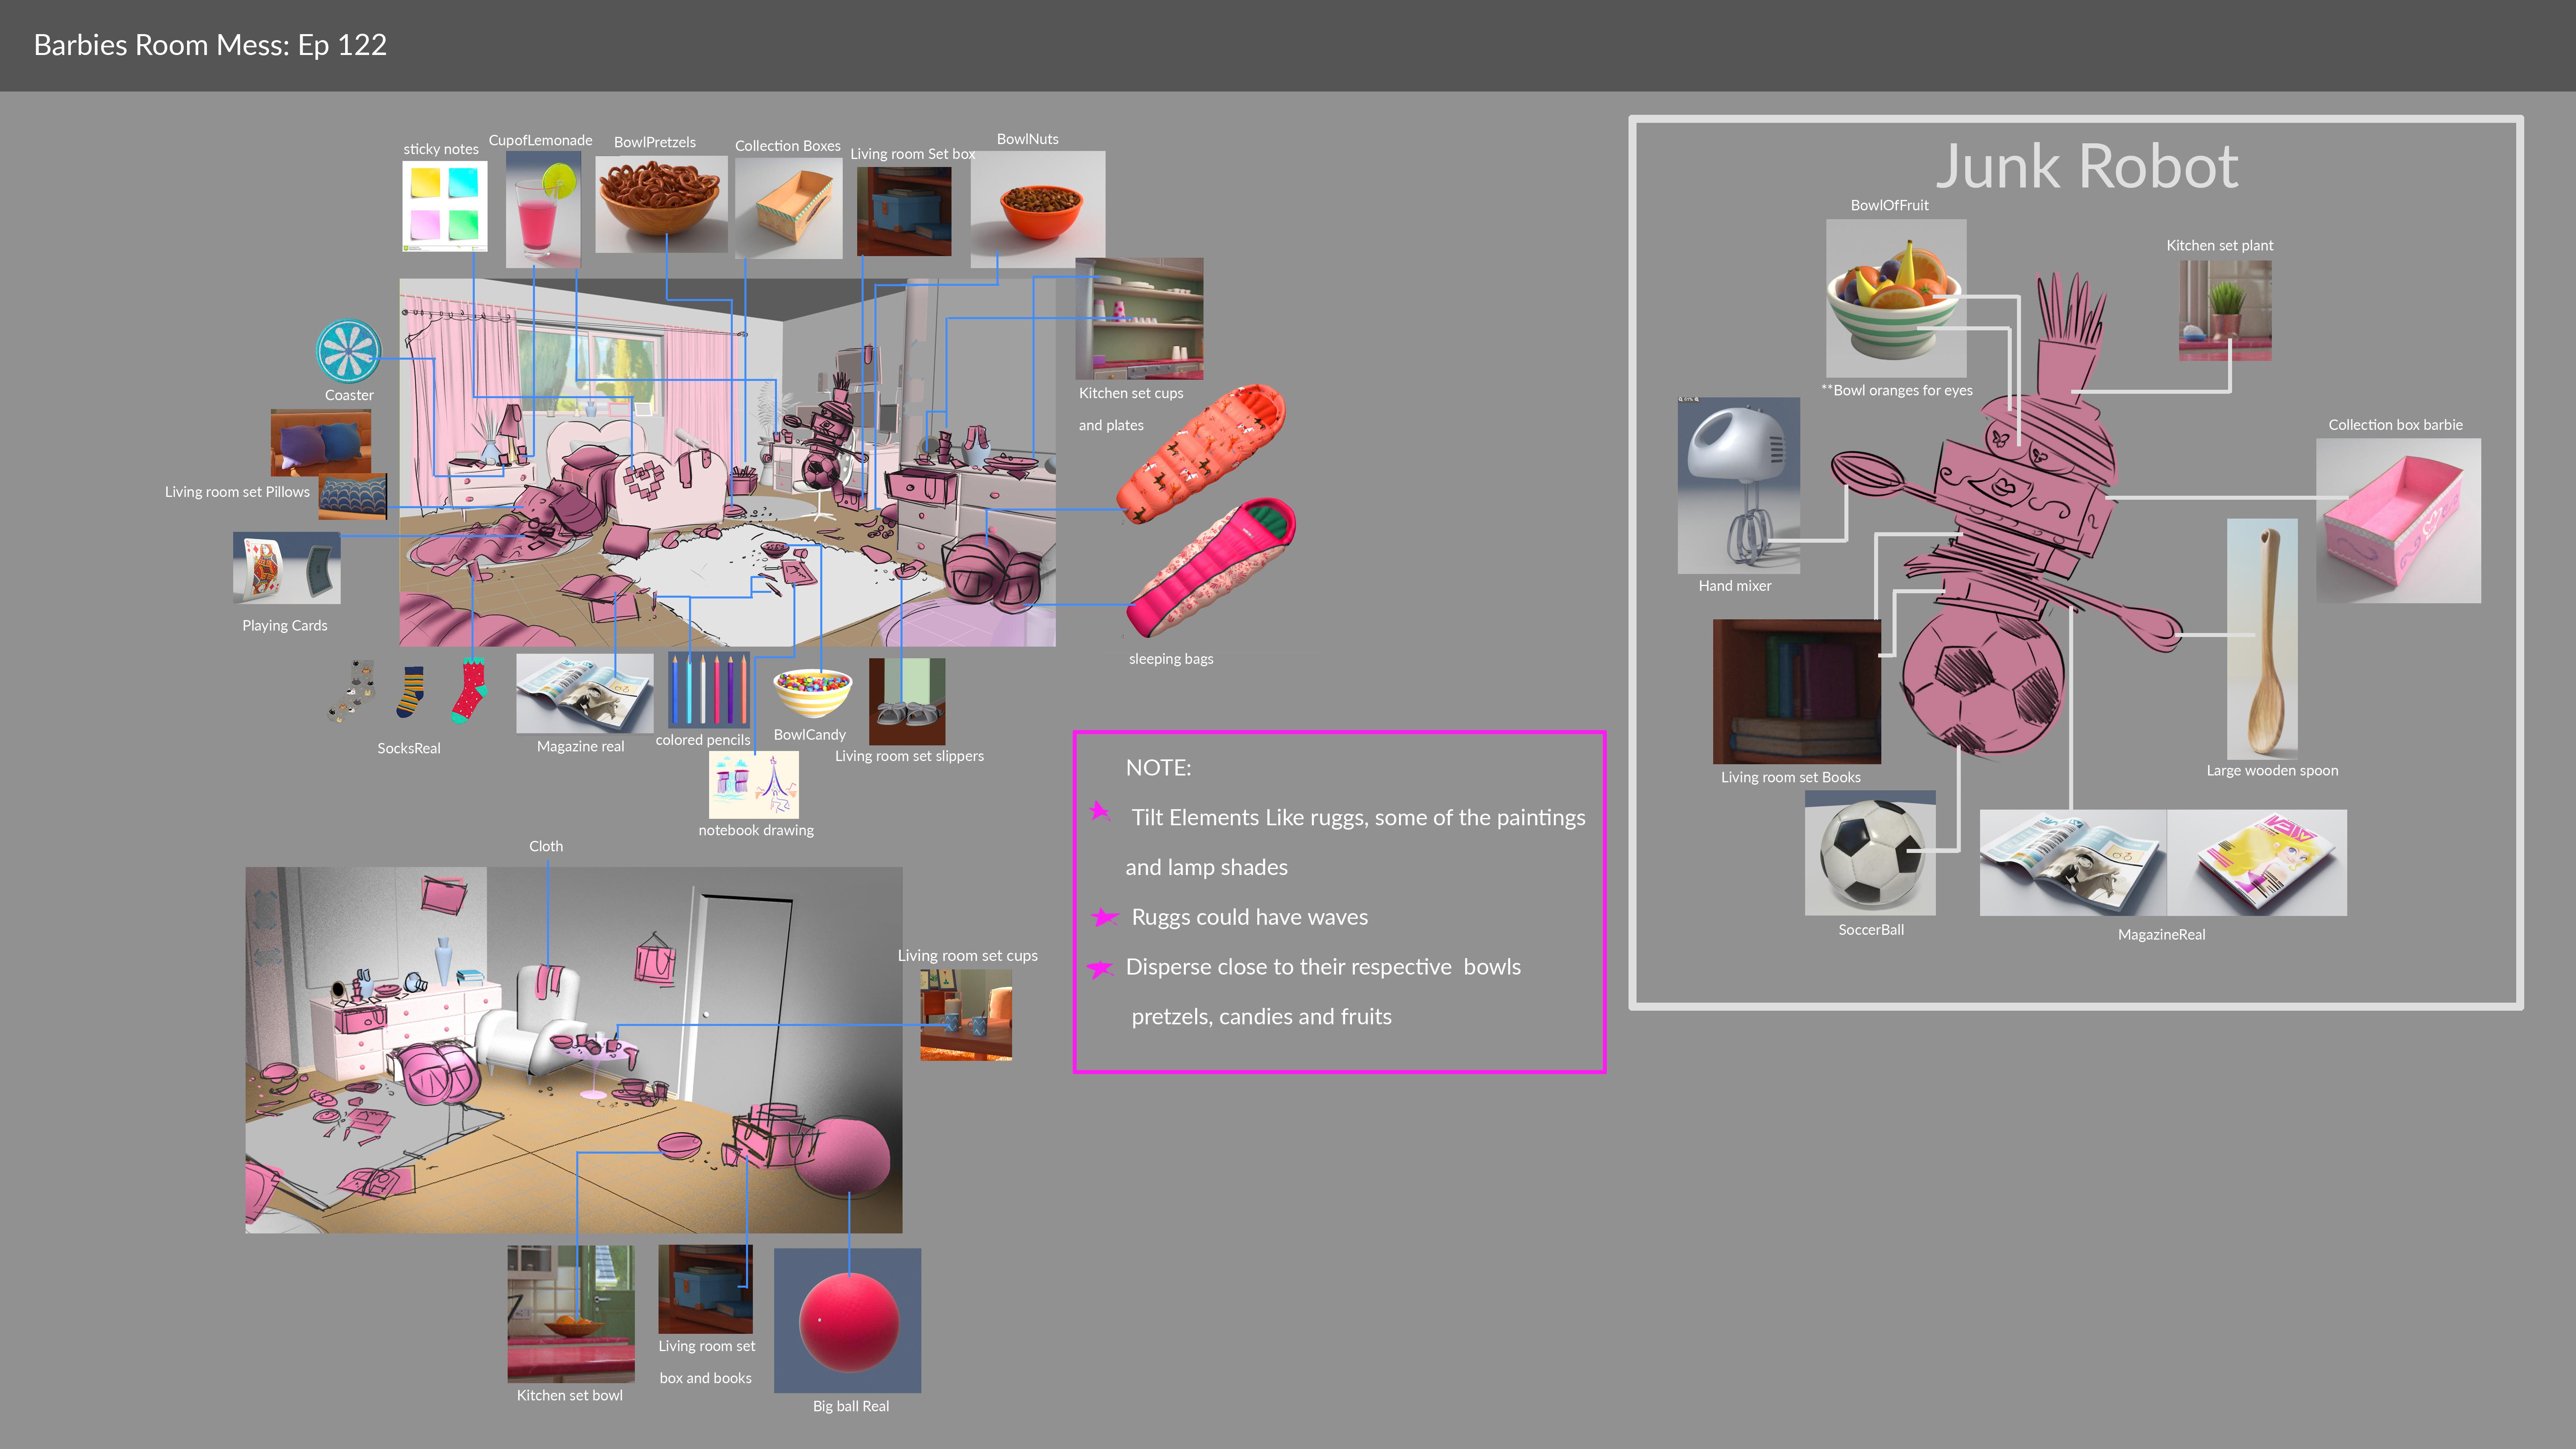 Barbies_Room_Mess_Ortho_CUR